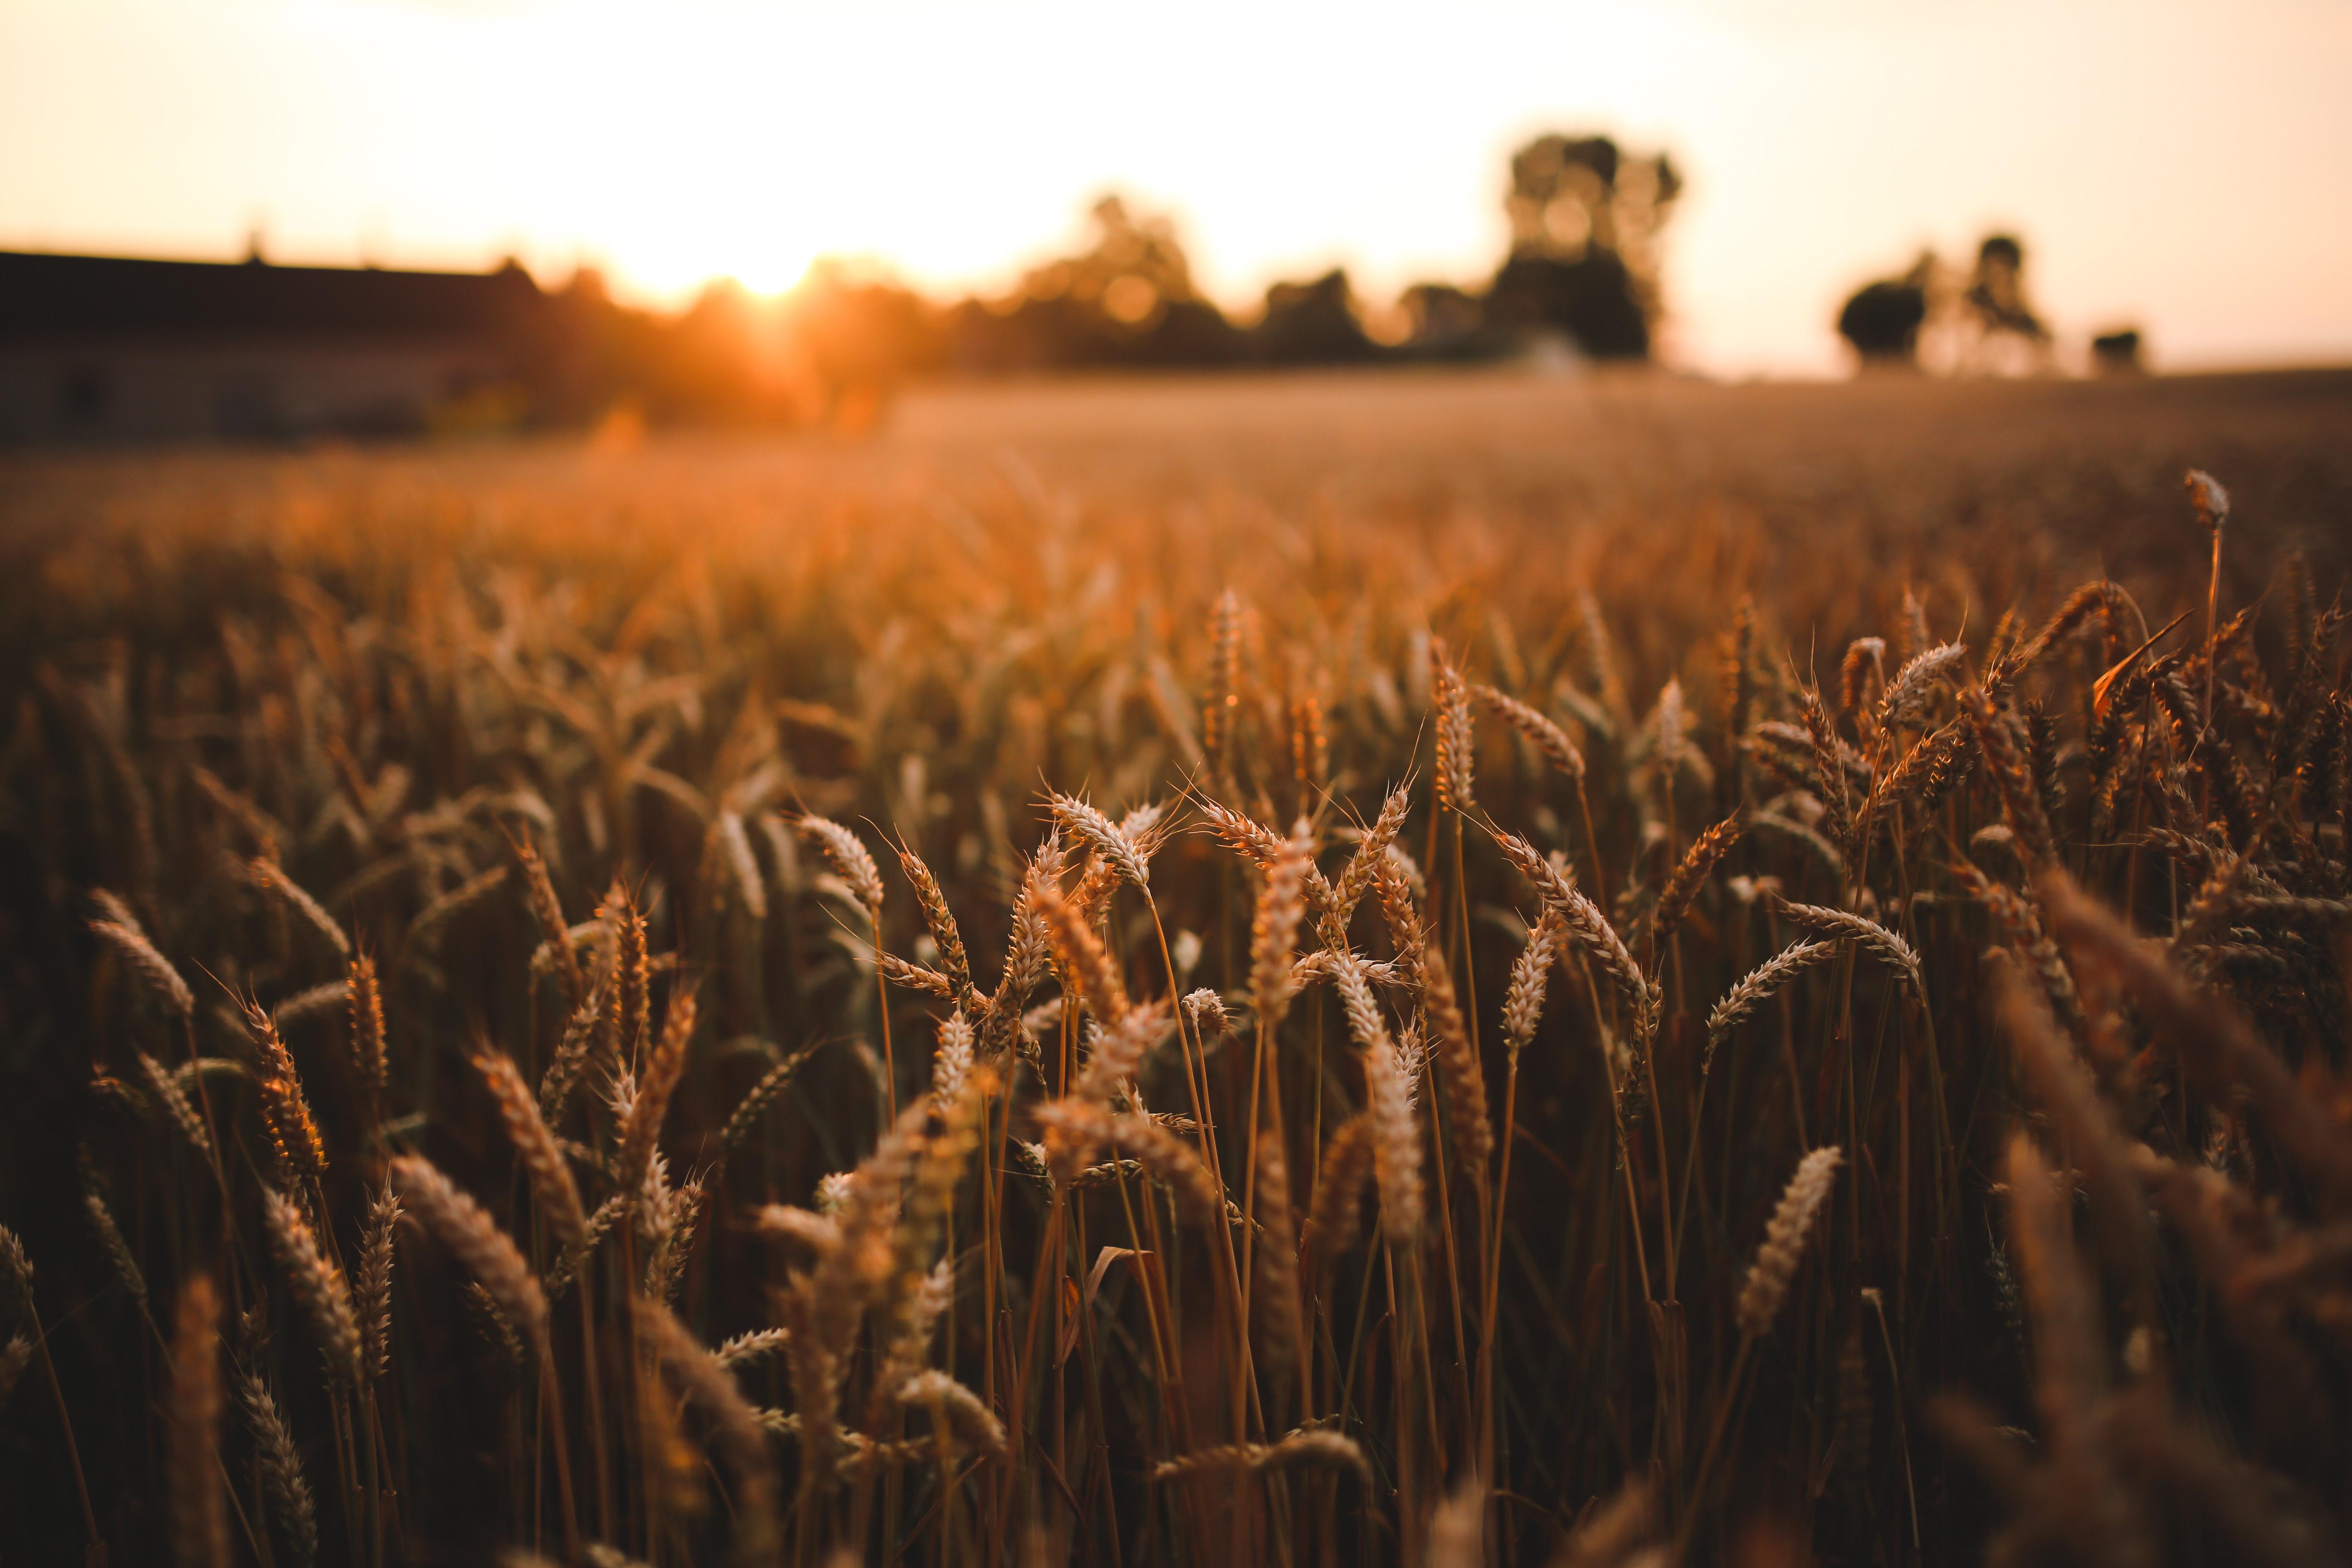 sunset-field-of-grain-5980